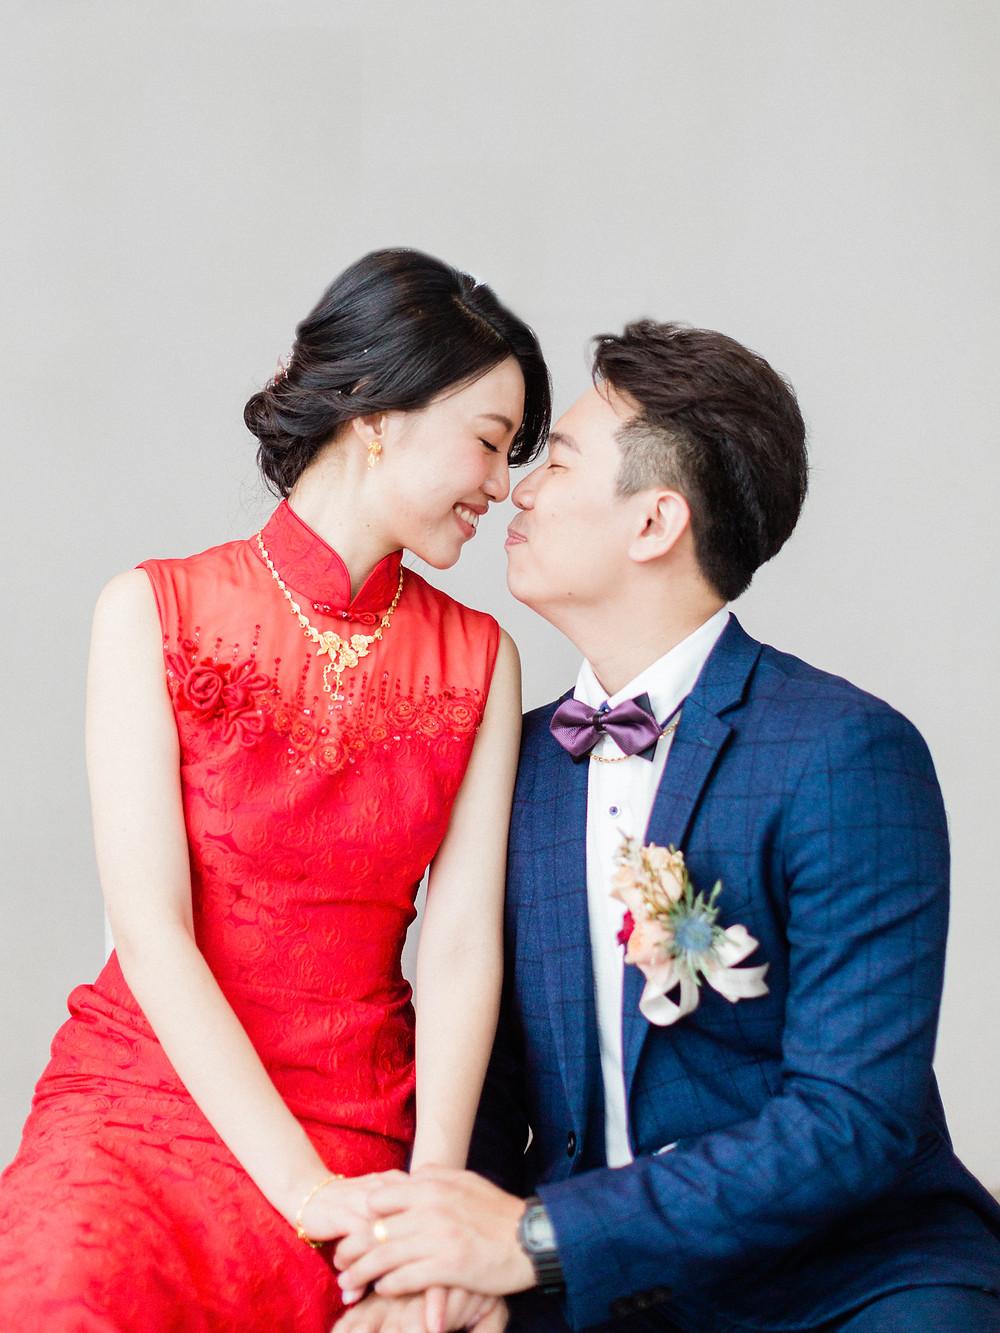 Joanna & Eric Wedding | Amba Taipei Songshan 台北松山意舍 Taiwan, 美式婚禮 Arther Chen Photography